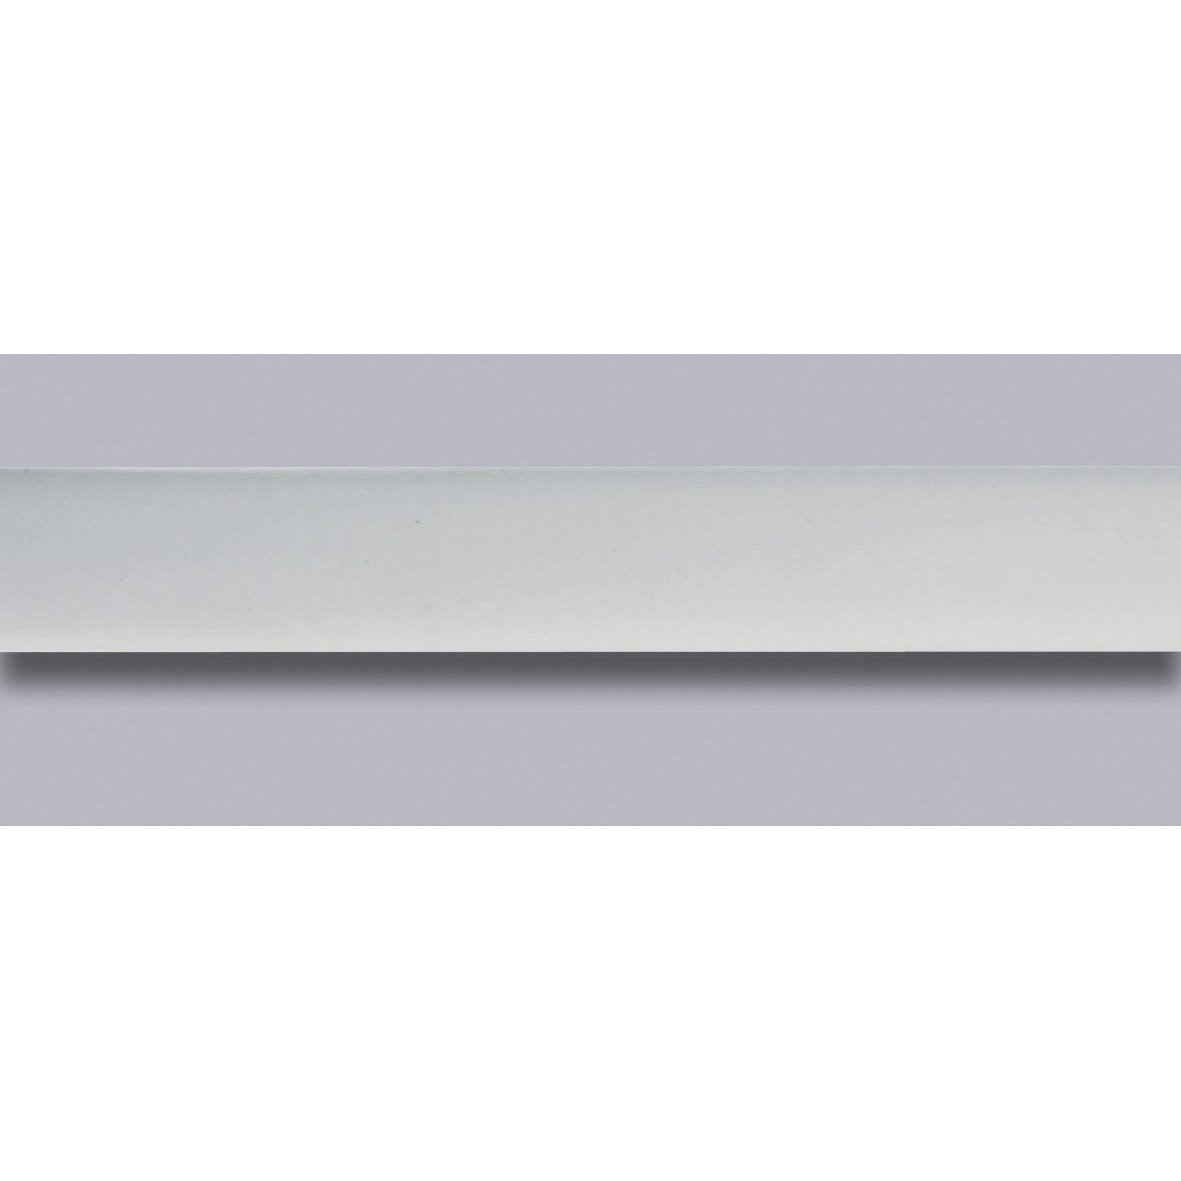 Barre de penderie blanc mat 150 cm leroy merlin - Barre penderie leroy merlin ...